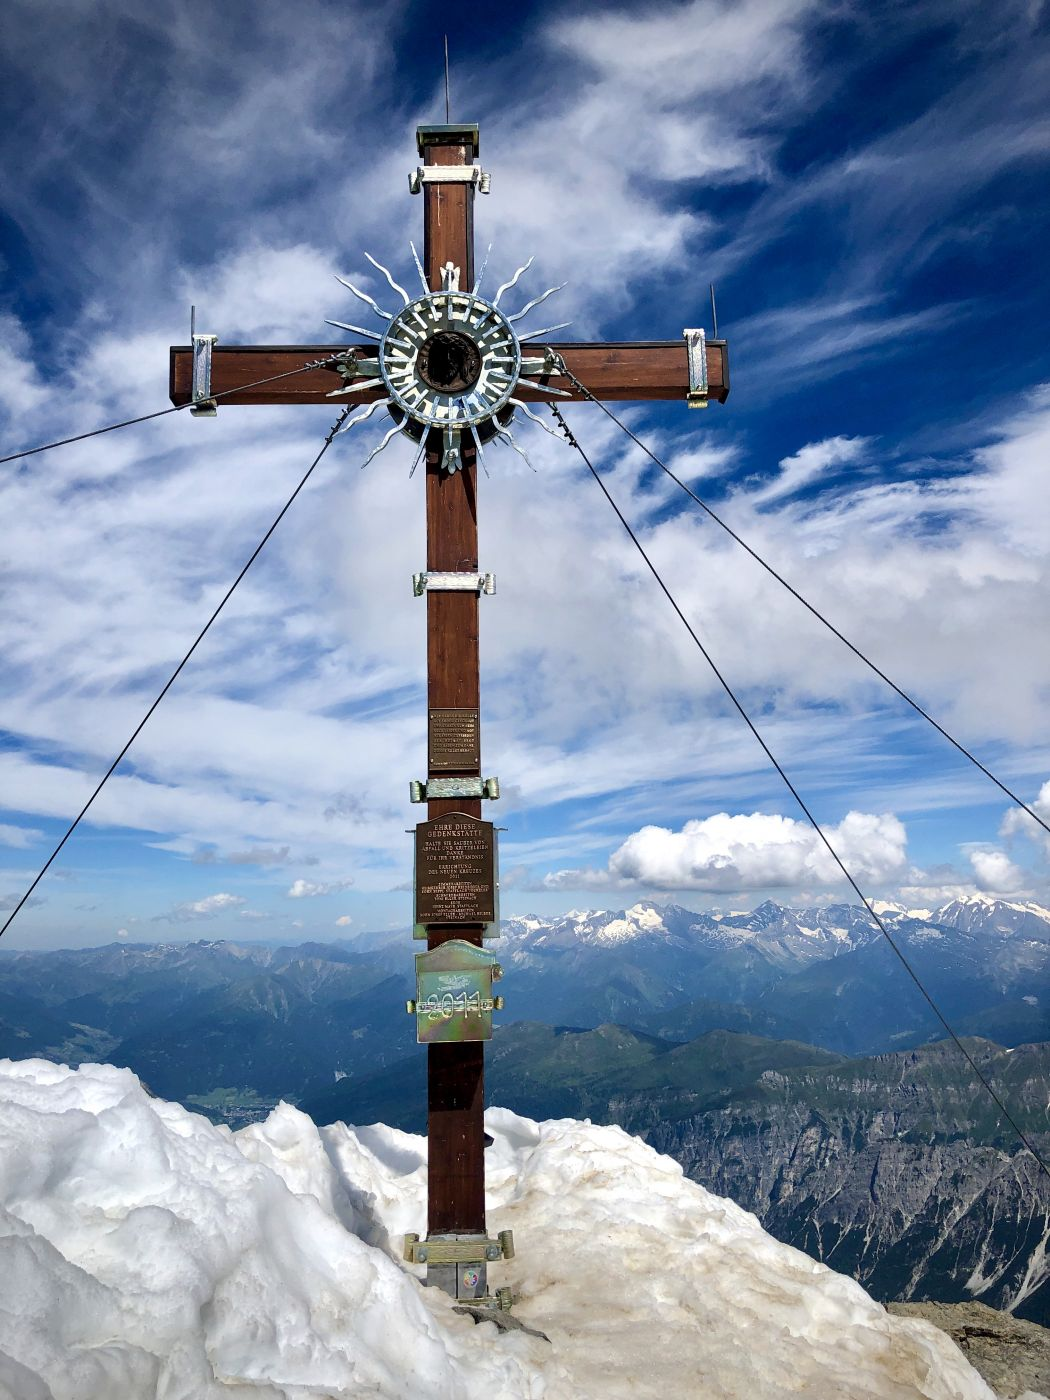 Habicht 3277m 1 of the Seven Summit Stubai, Austria